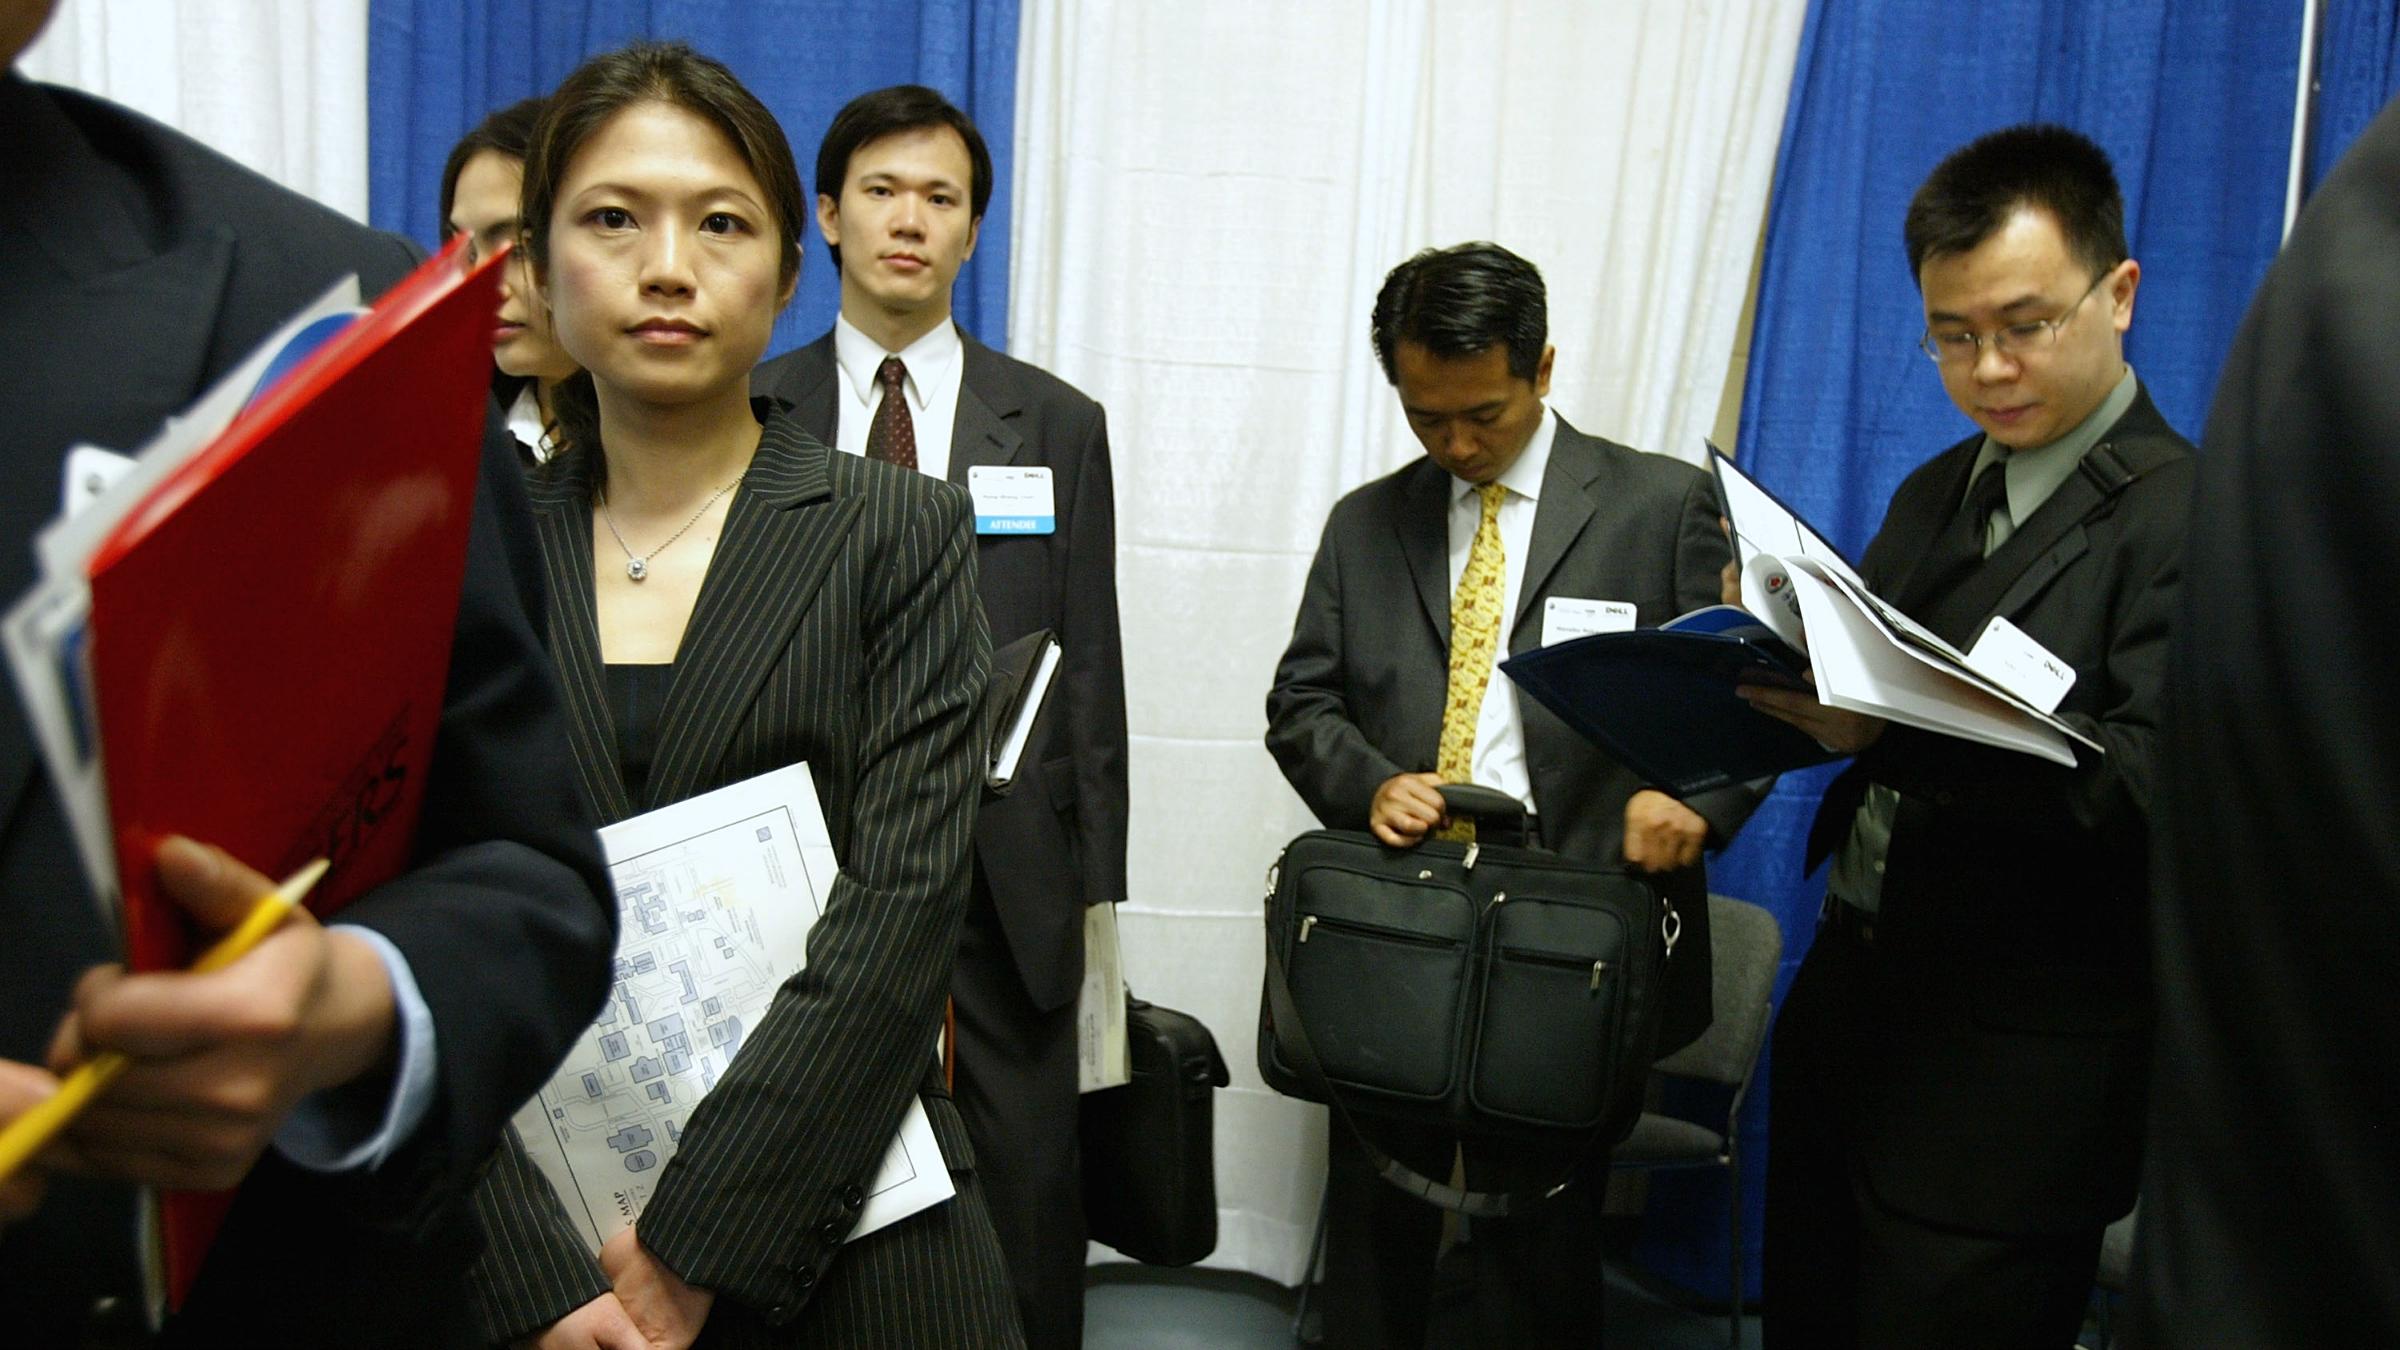 Job applicants at Asian Diversity Career Expo